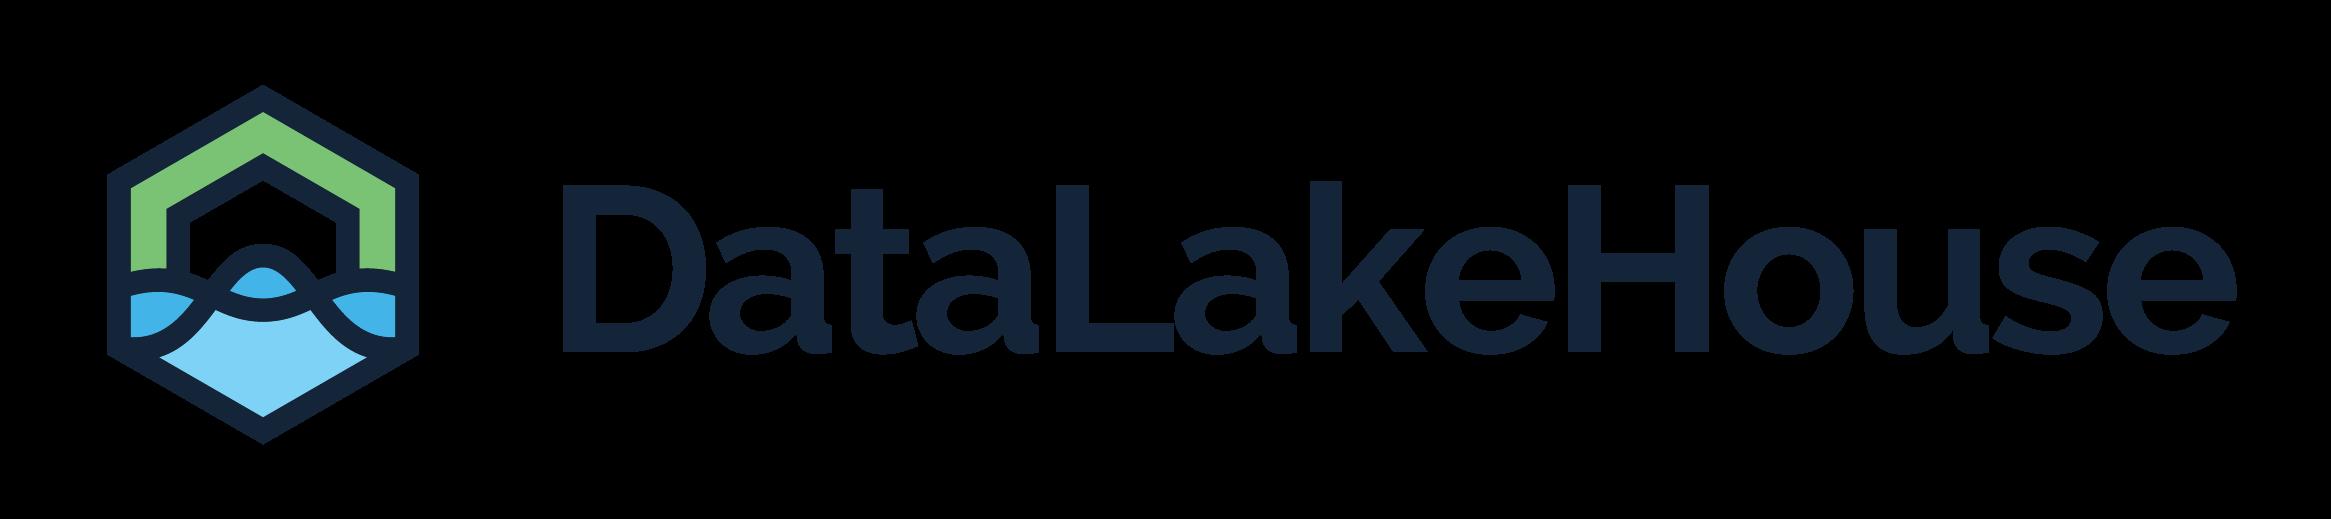 DataLakeHouse Blog